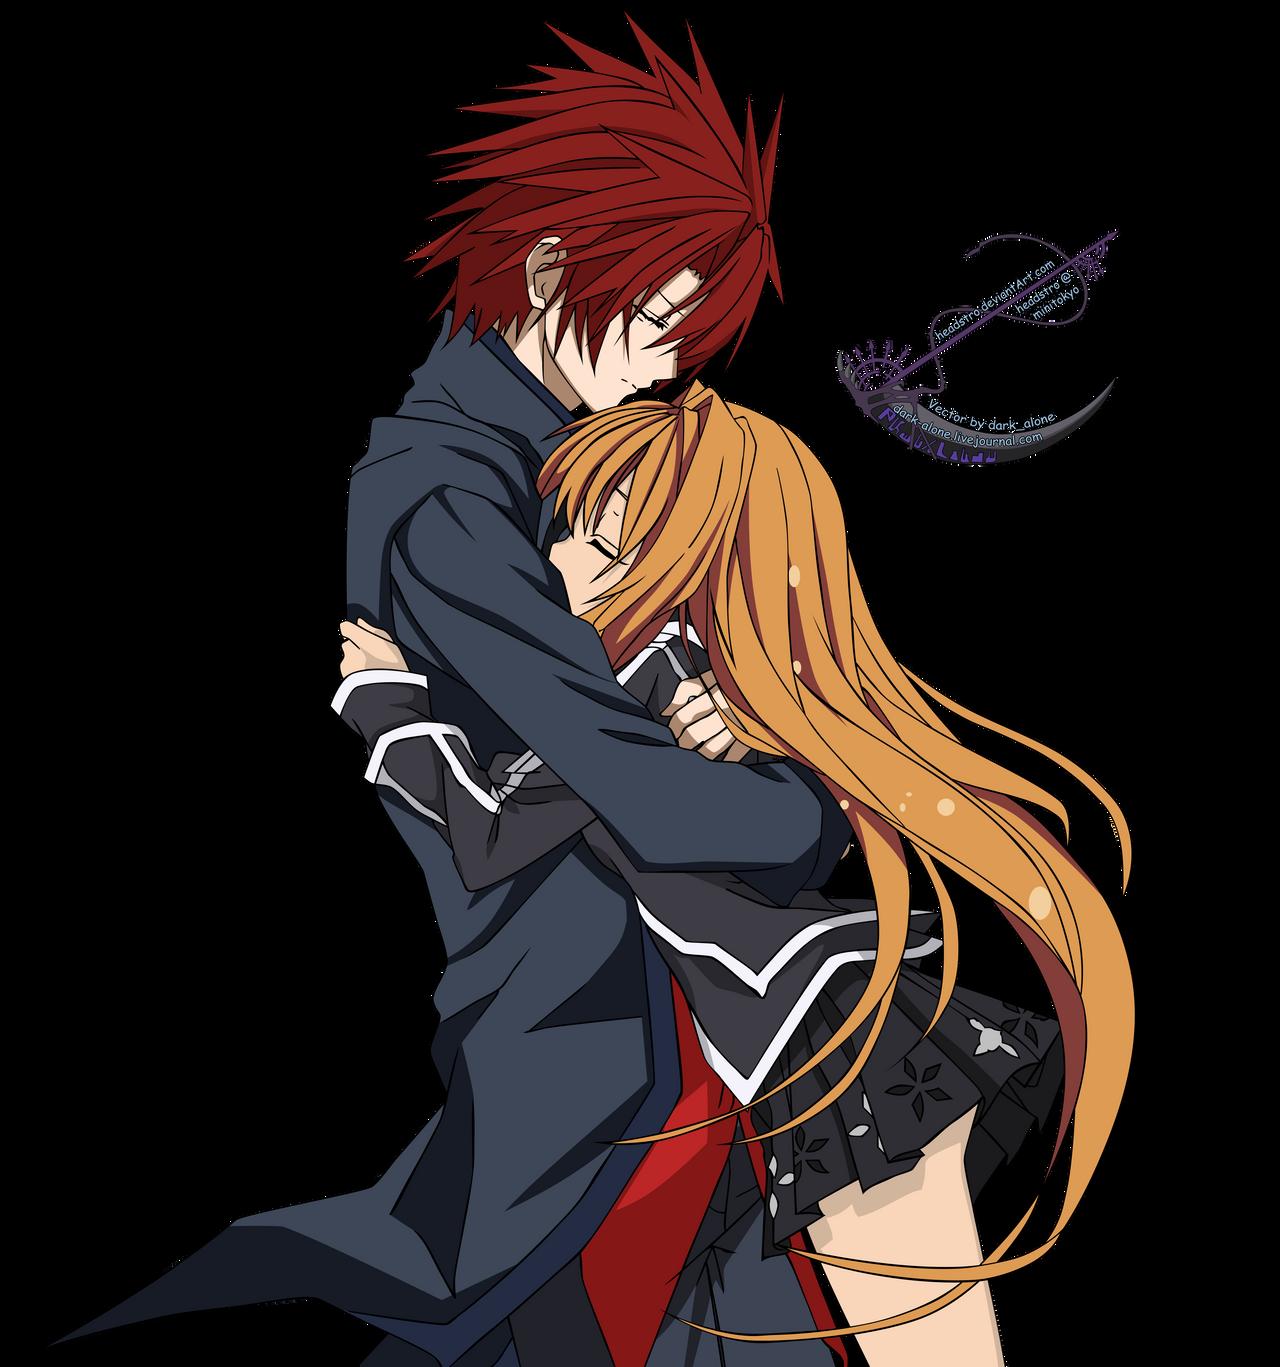 Arisu and Ai - Vector by headstro